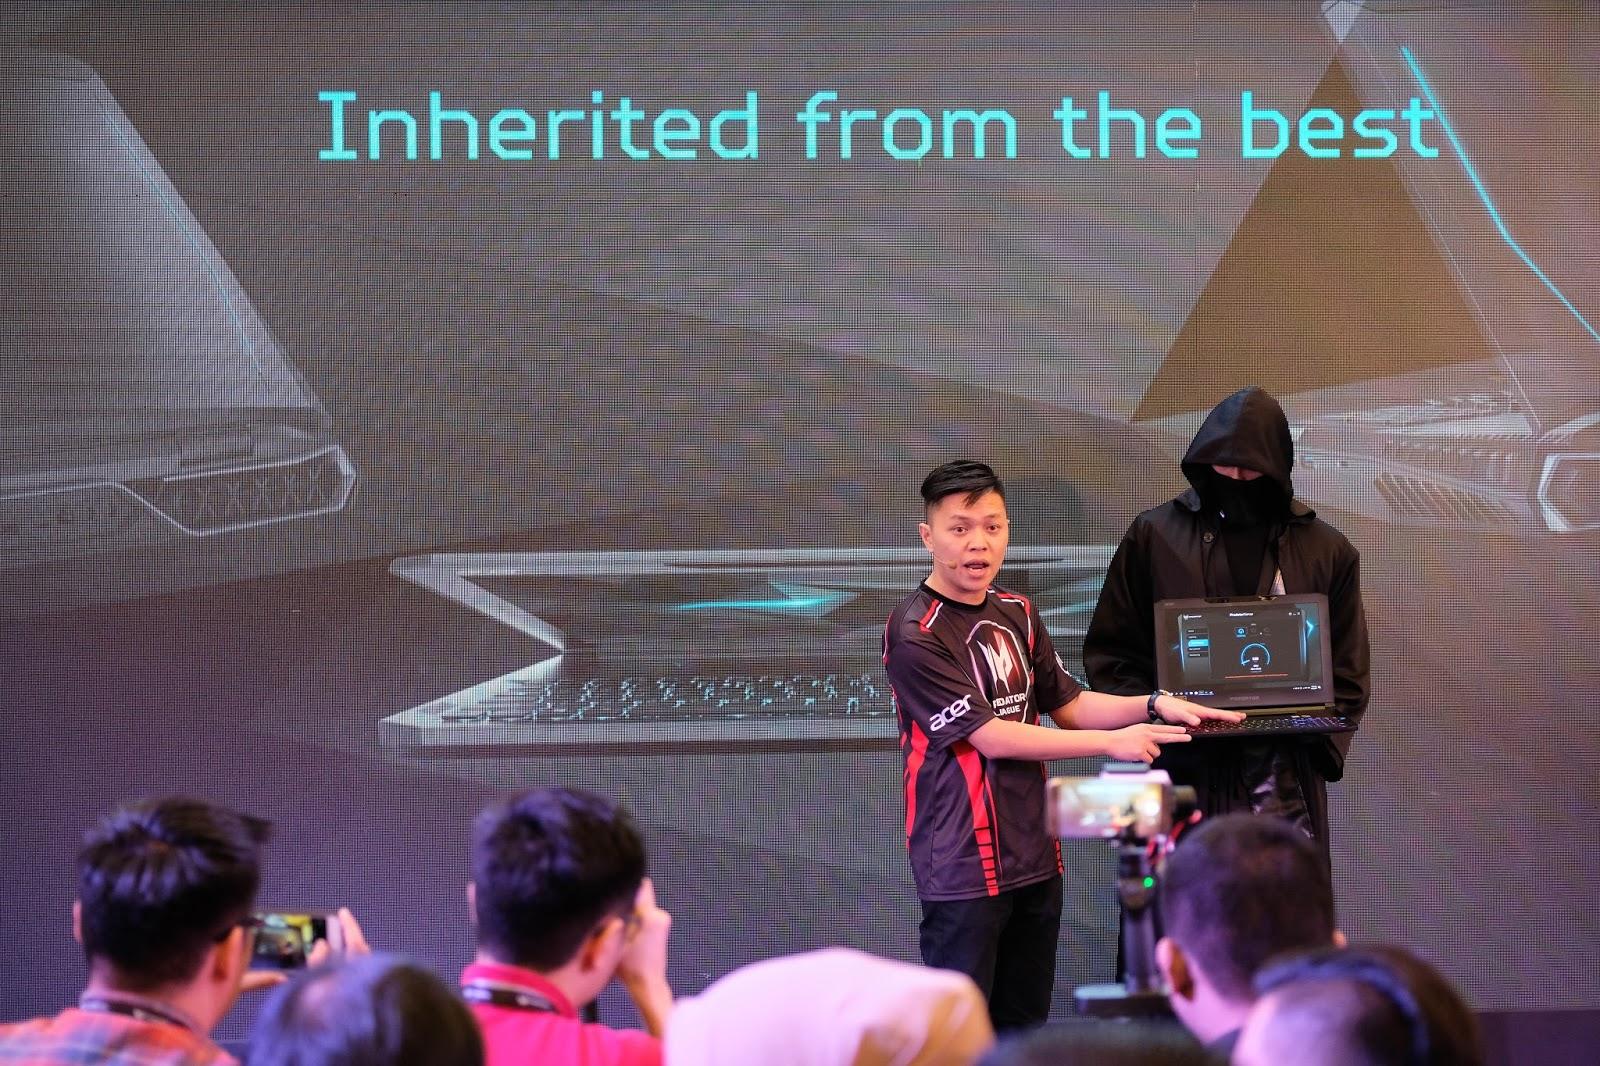 EVENT] Acer Malaysia bringing in the Beast - Predator Triton